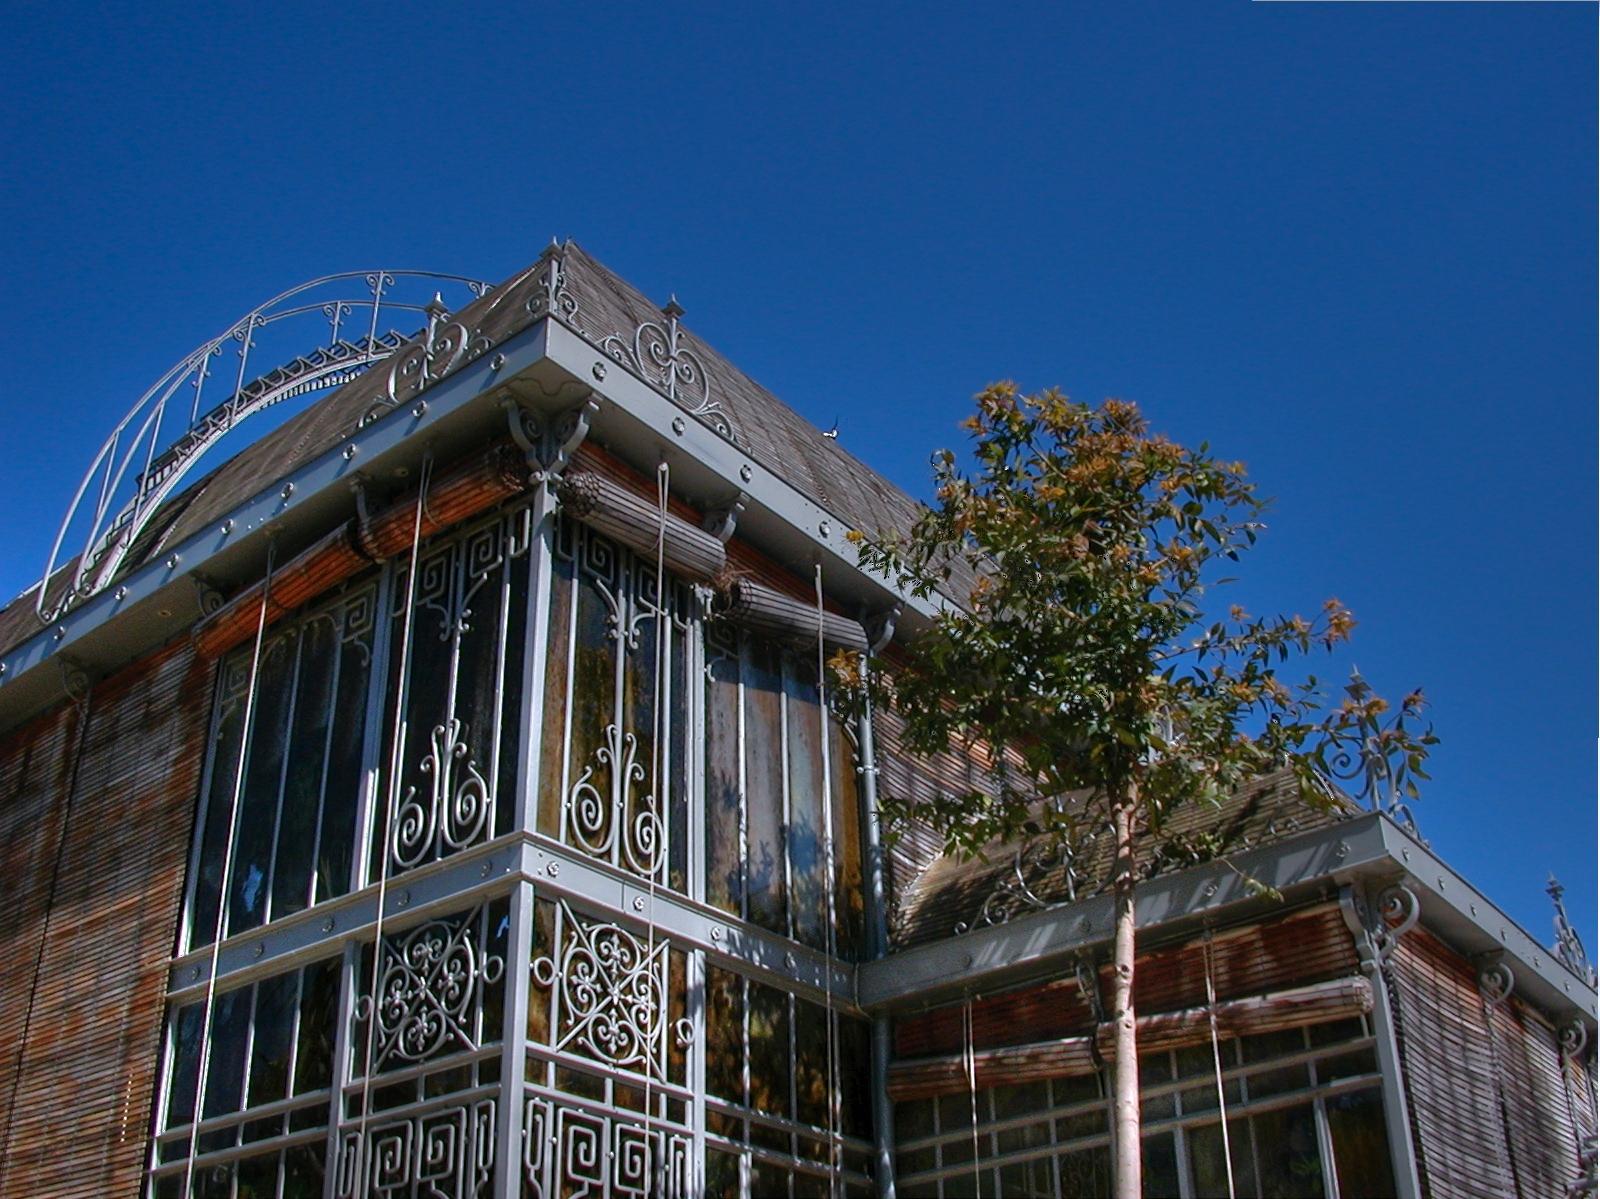 File:Jardin des plantes Nantes-palmarium.jpg - Wikimedia Commons